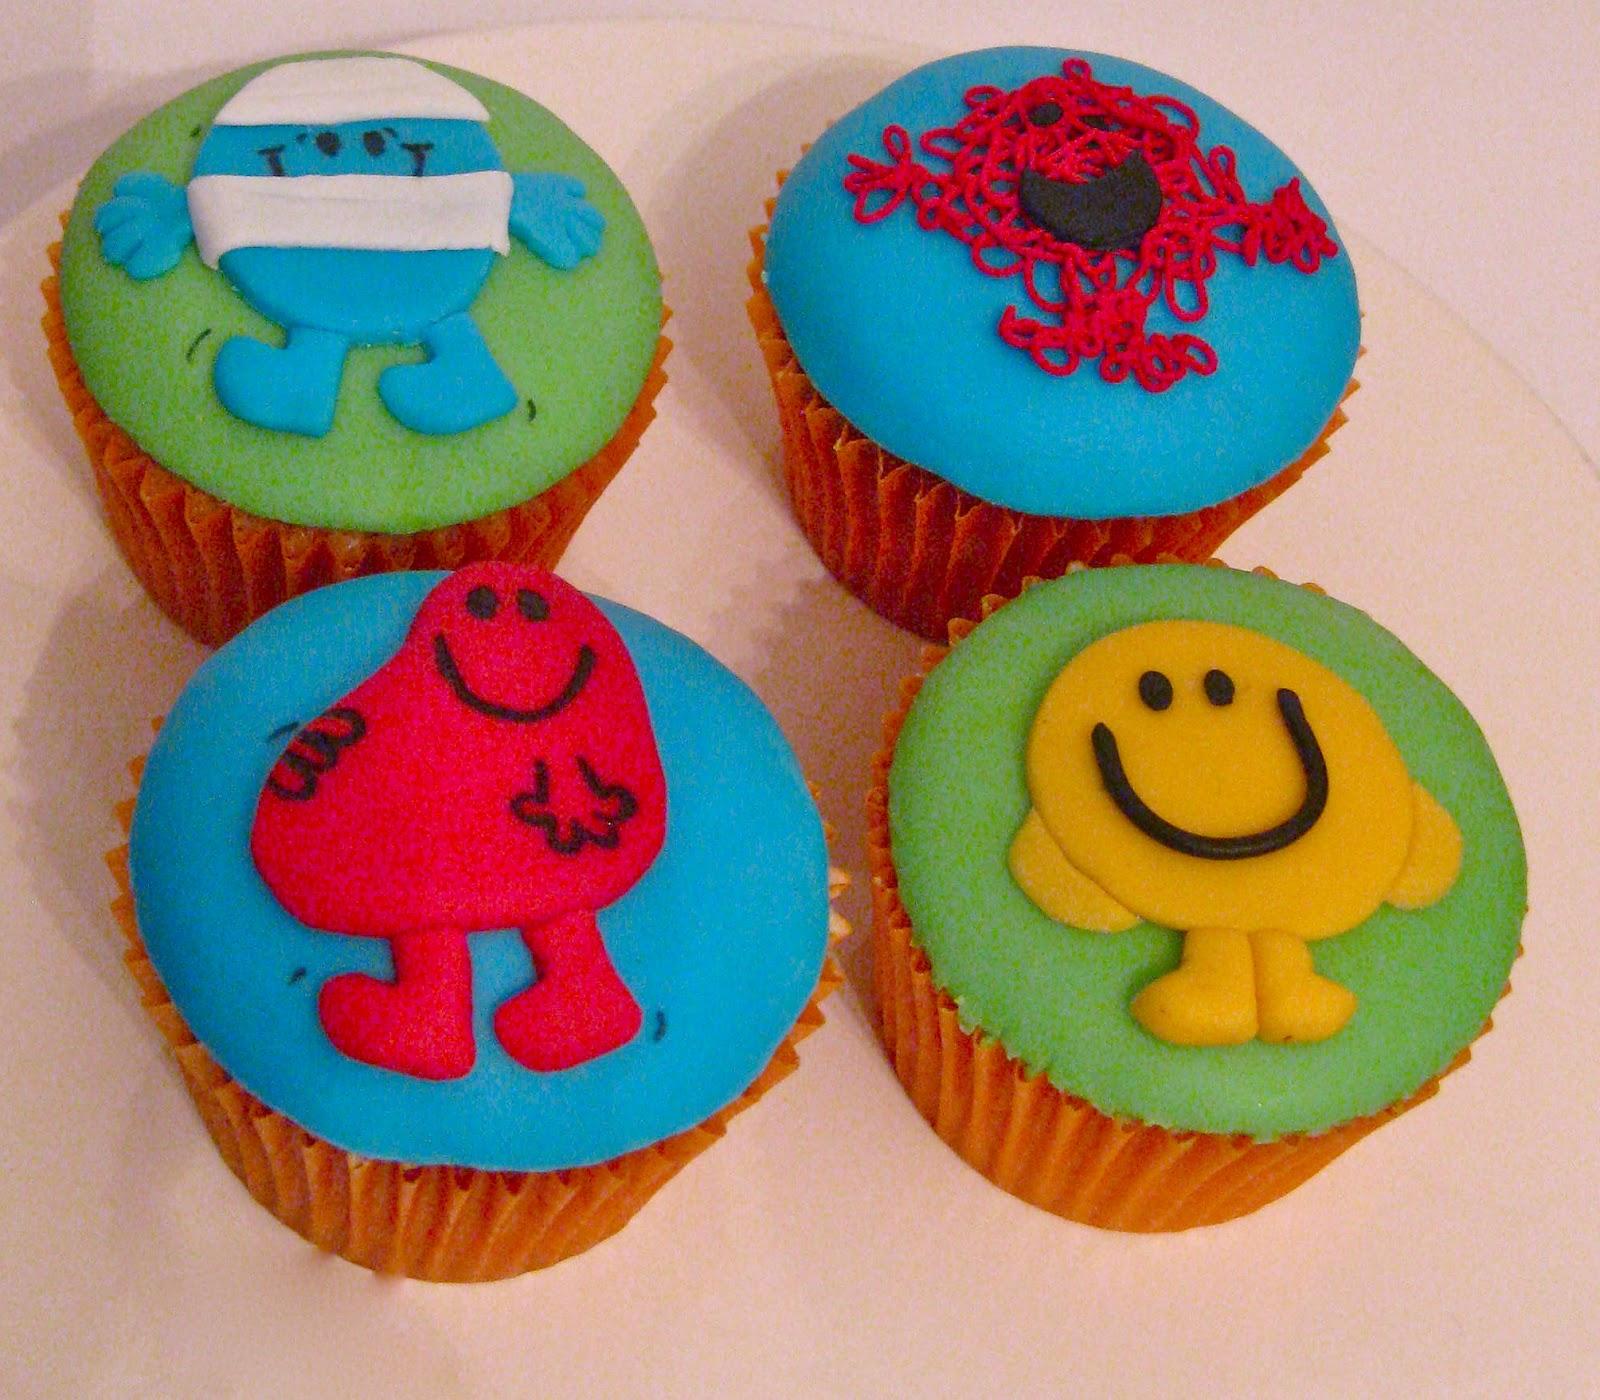 Mr Tickle And Mr Men Cupcakes Boutique Cake Shop